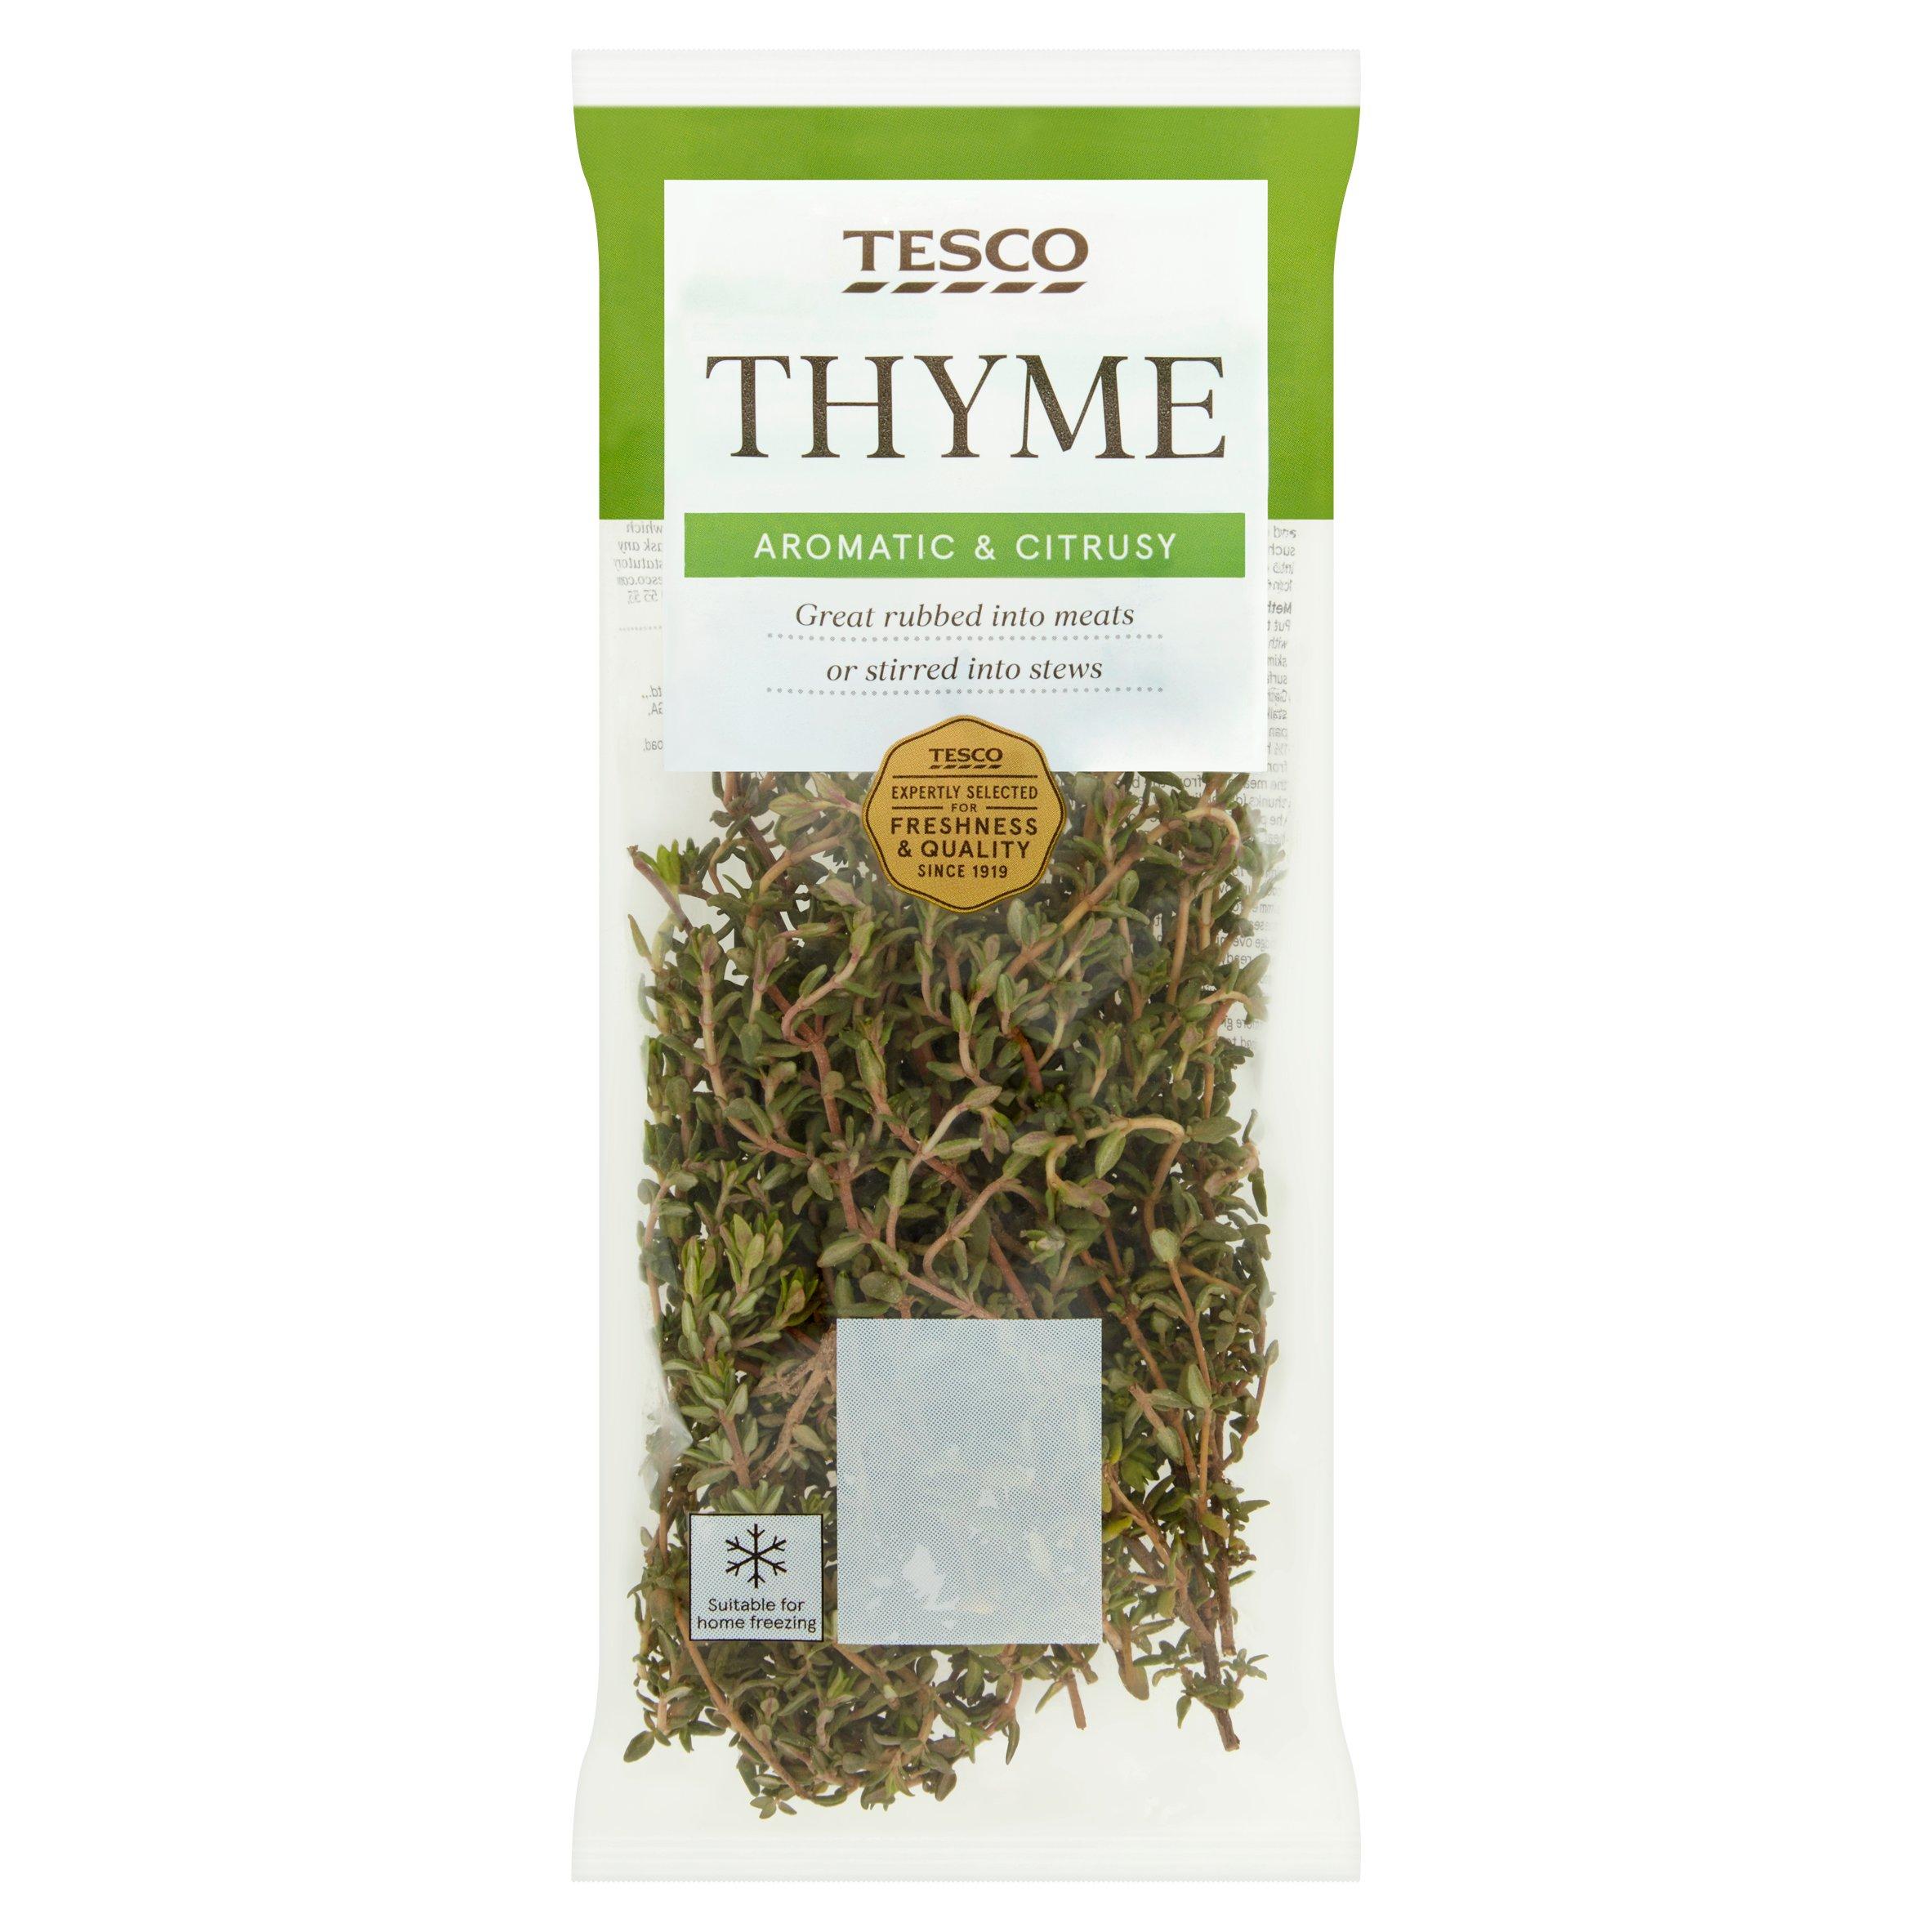 Tesco Thyme 20G